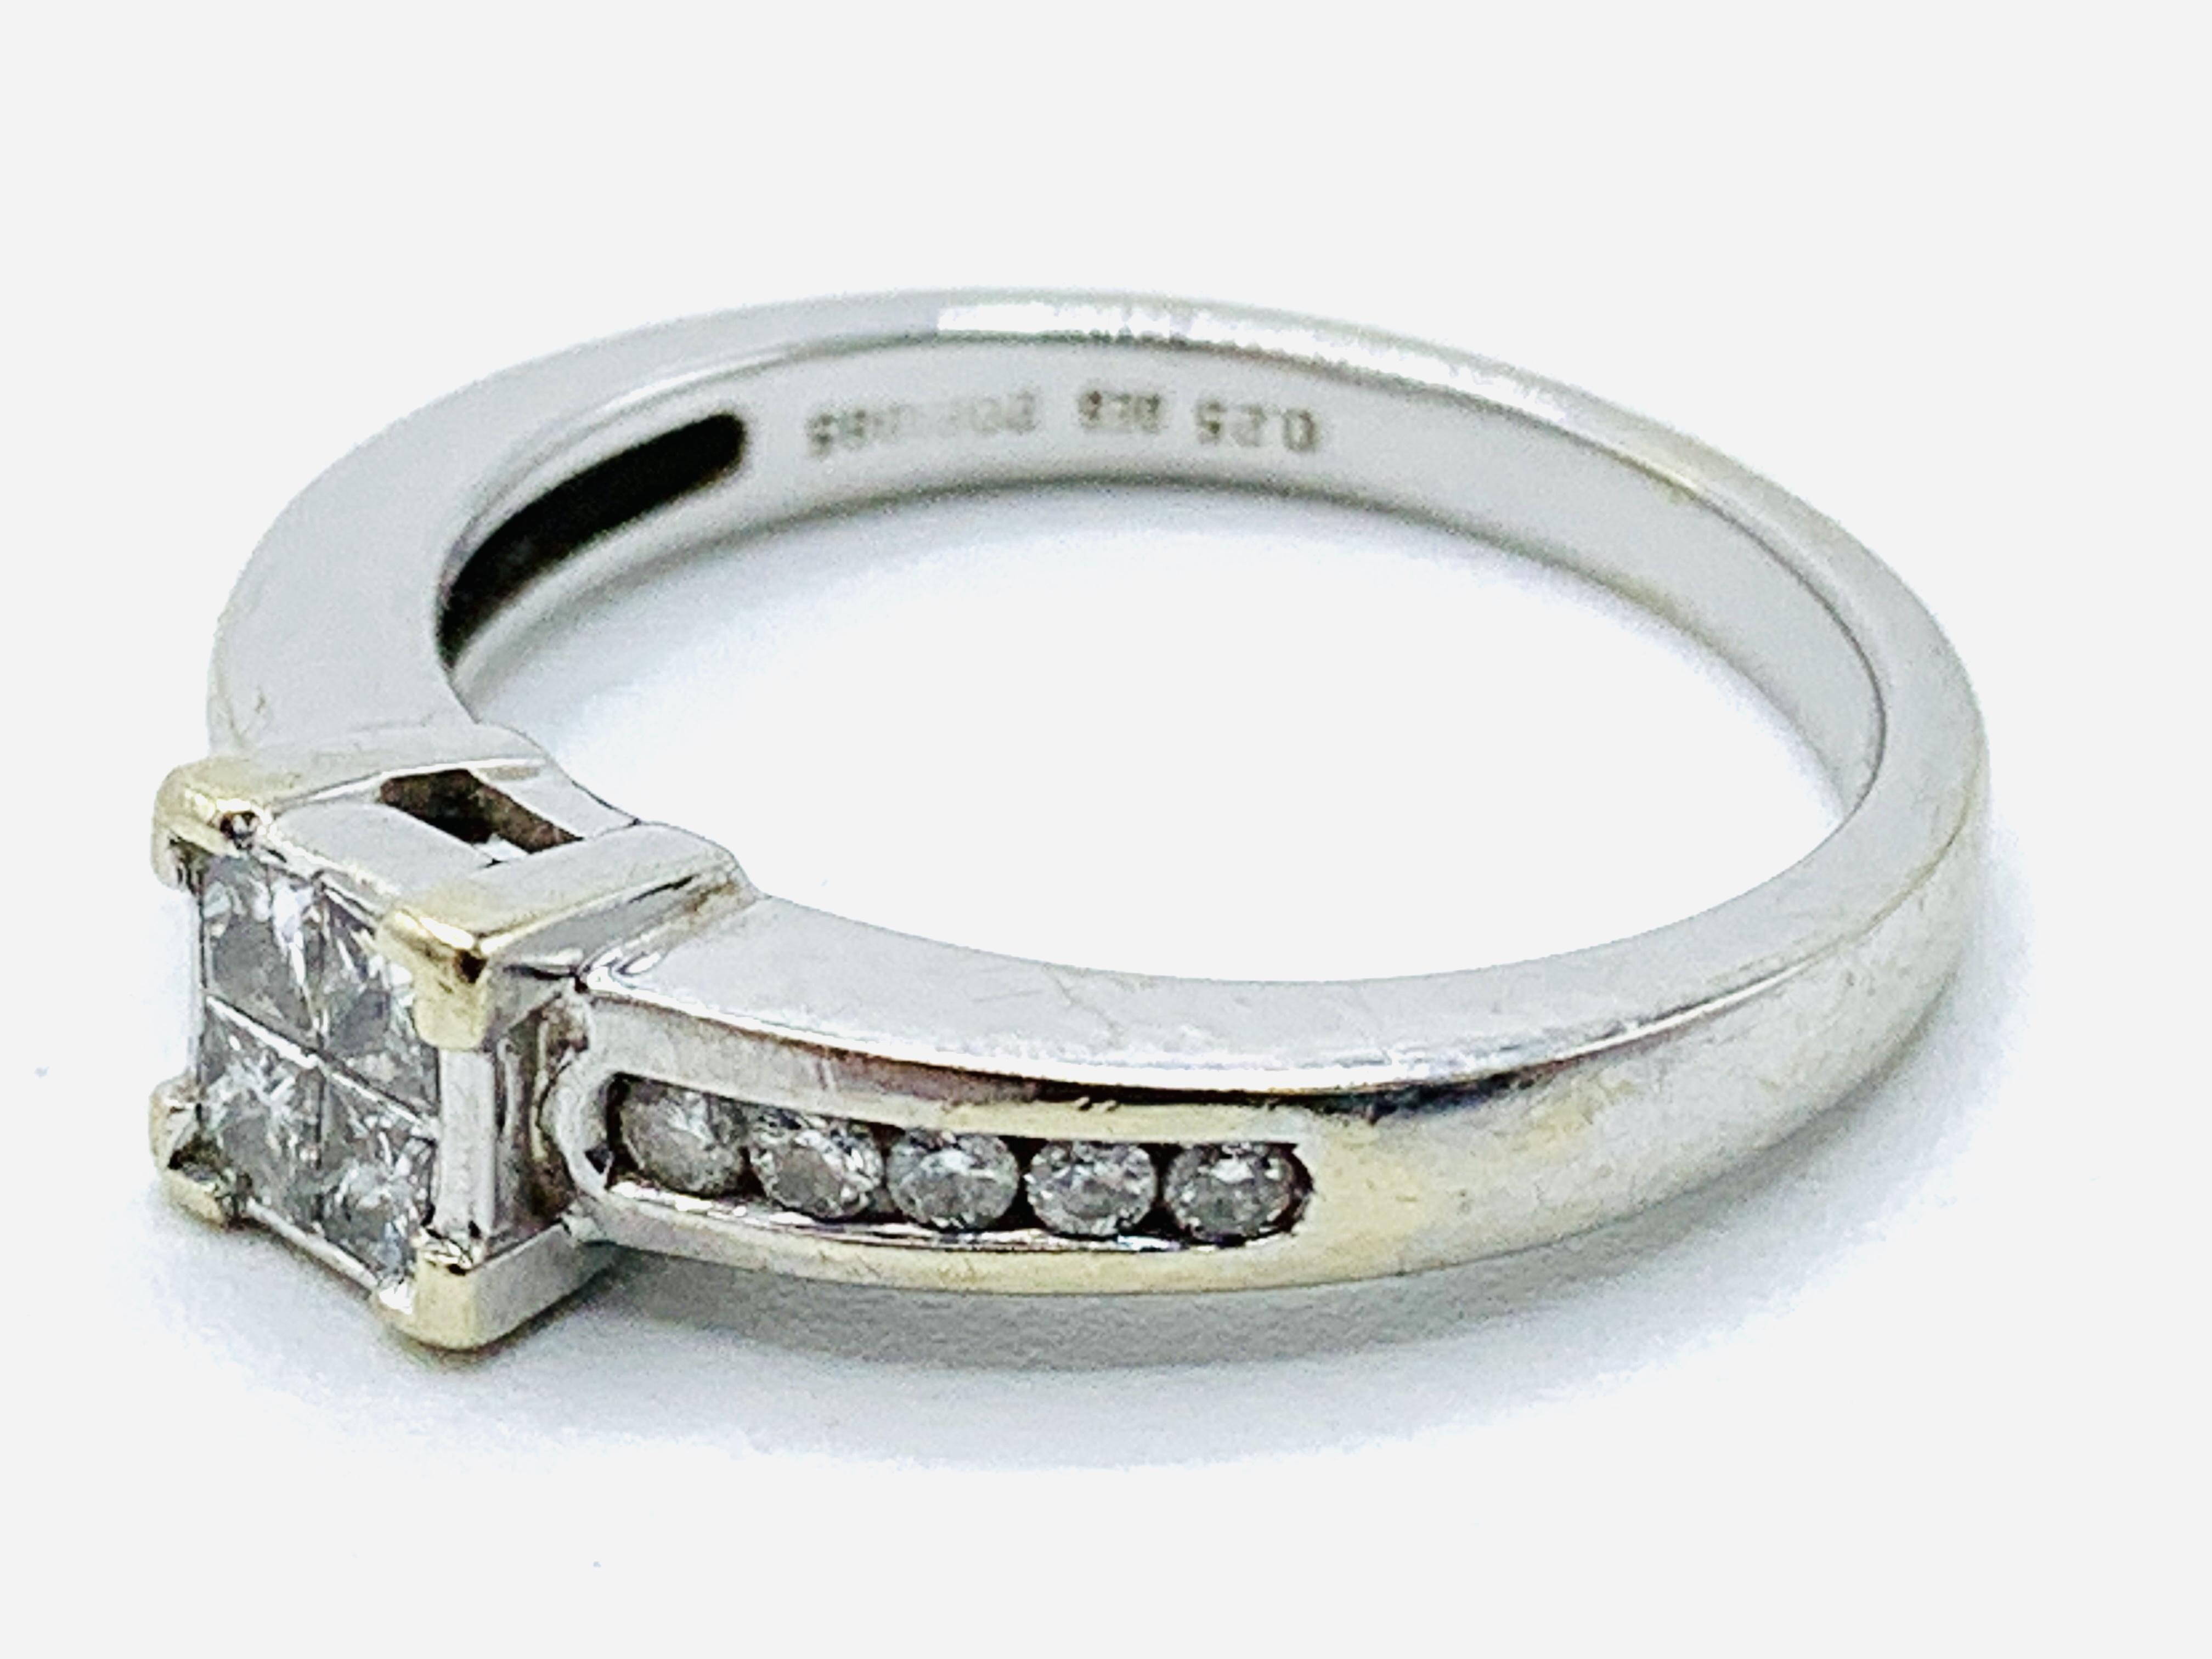 18ct white gold ring - Image 2 of 4